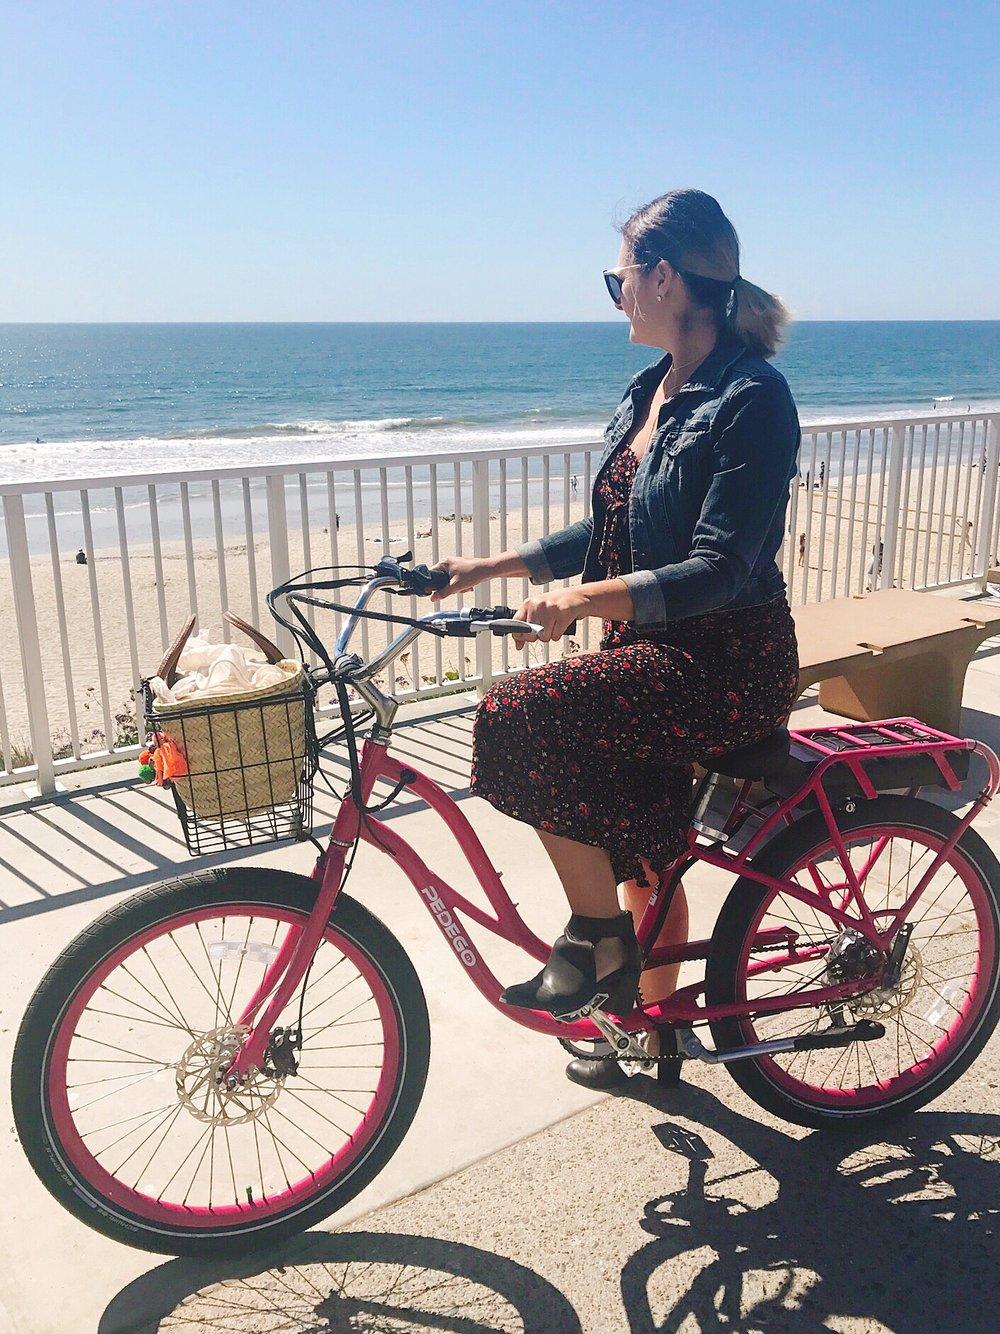 Bike ride at Carlsbad Beach, California